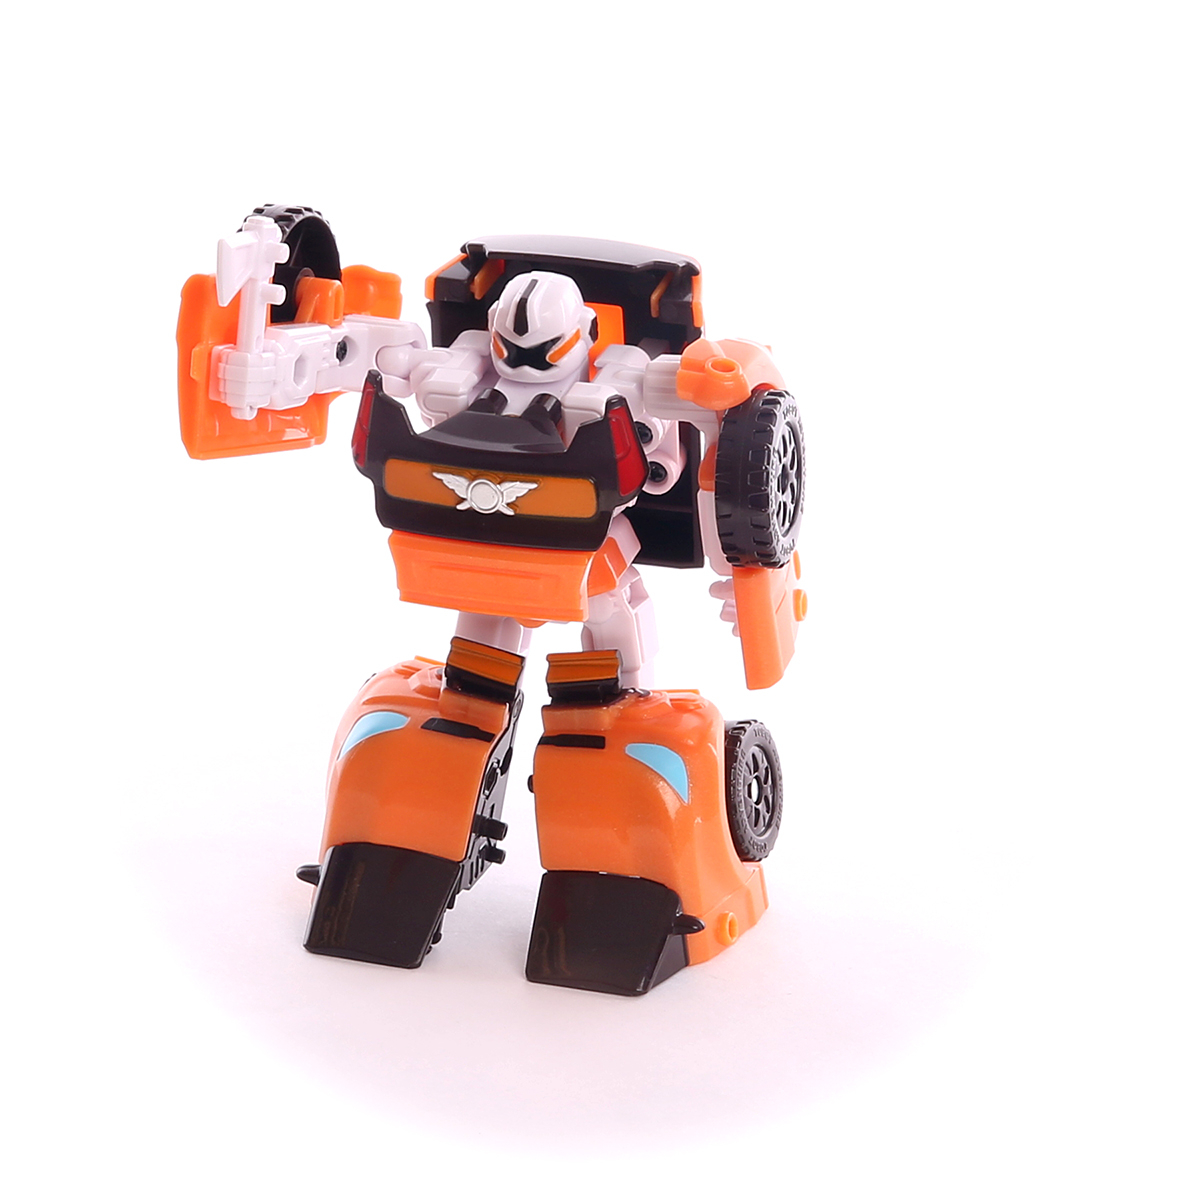 Трансформер Гулливер Мини Тобот Приключения Х 301044 yuong toys трансформер мини тобот х